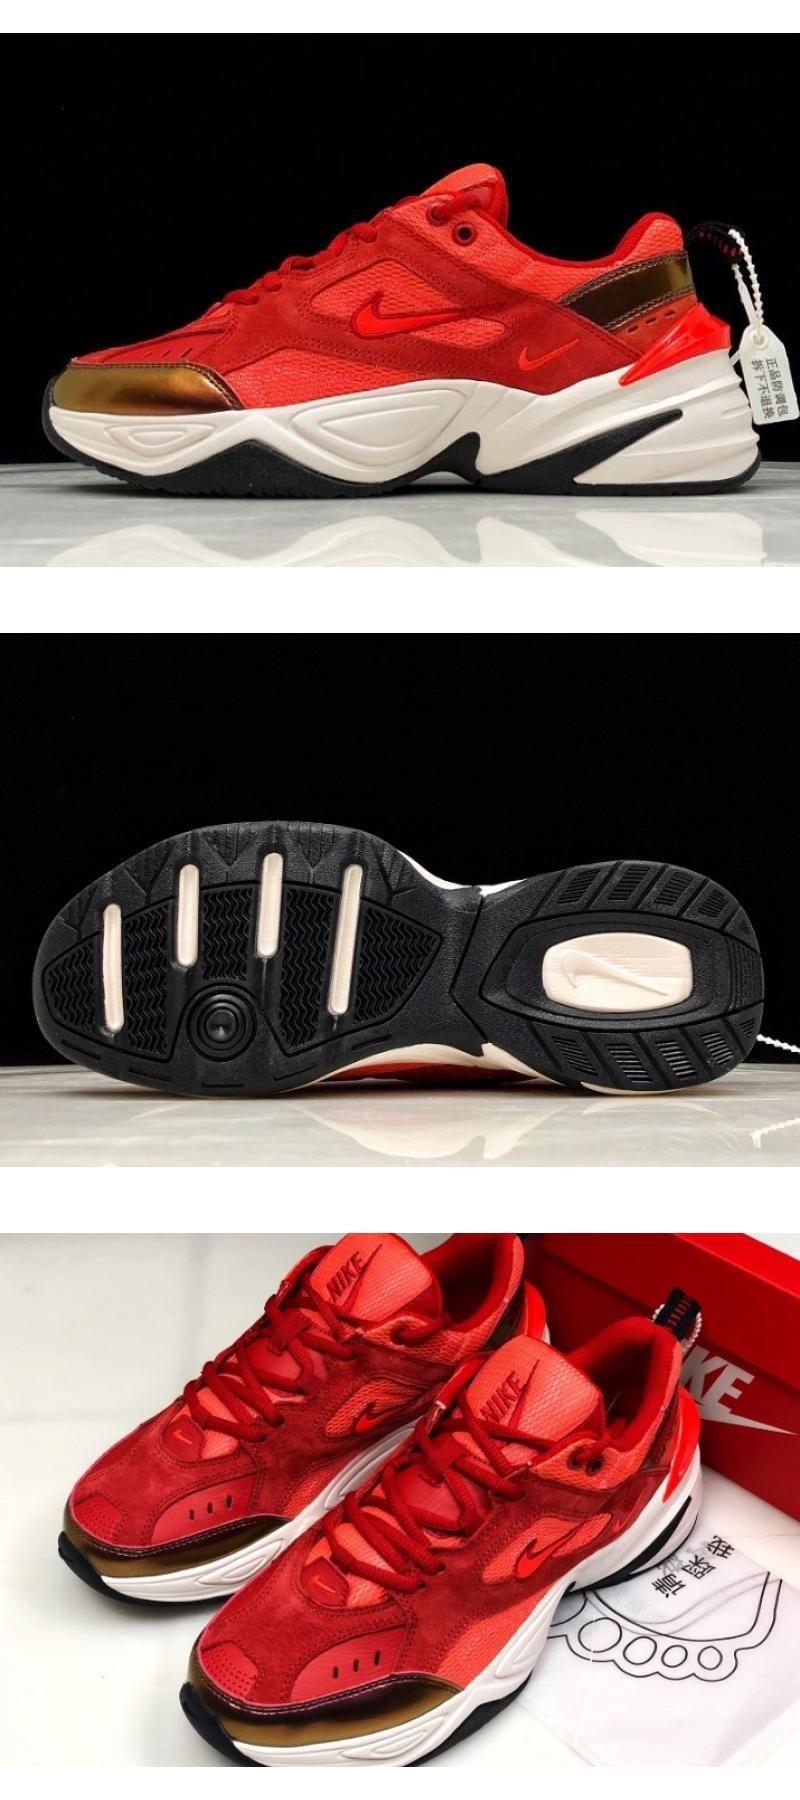 2019 Rushed Time Limited Nike M2k Tekno Red Suede University Red Phanton Bright Crimson Av7030 600 Personatresgrata 2019 Rushed Time L Nike Red Suede Suede